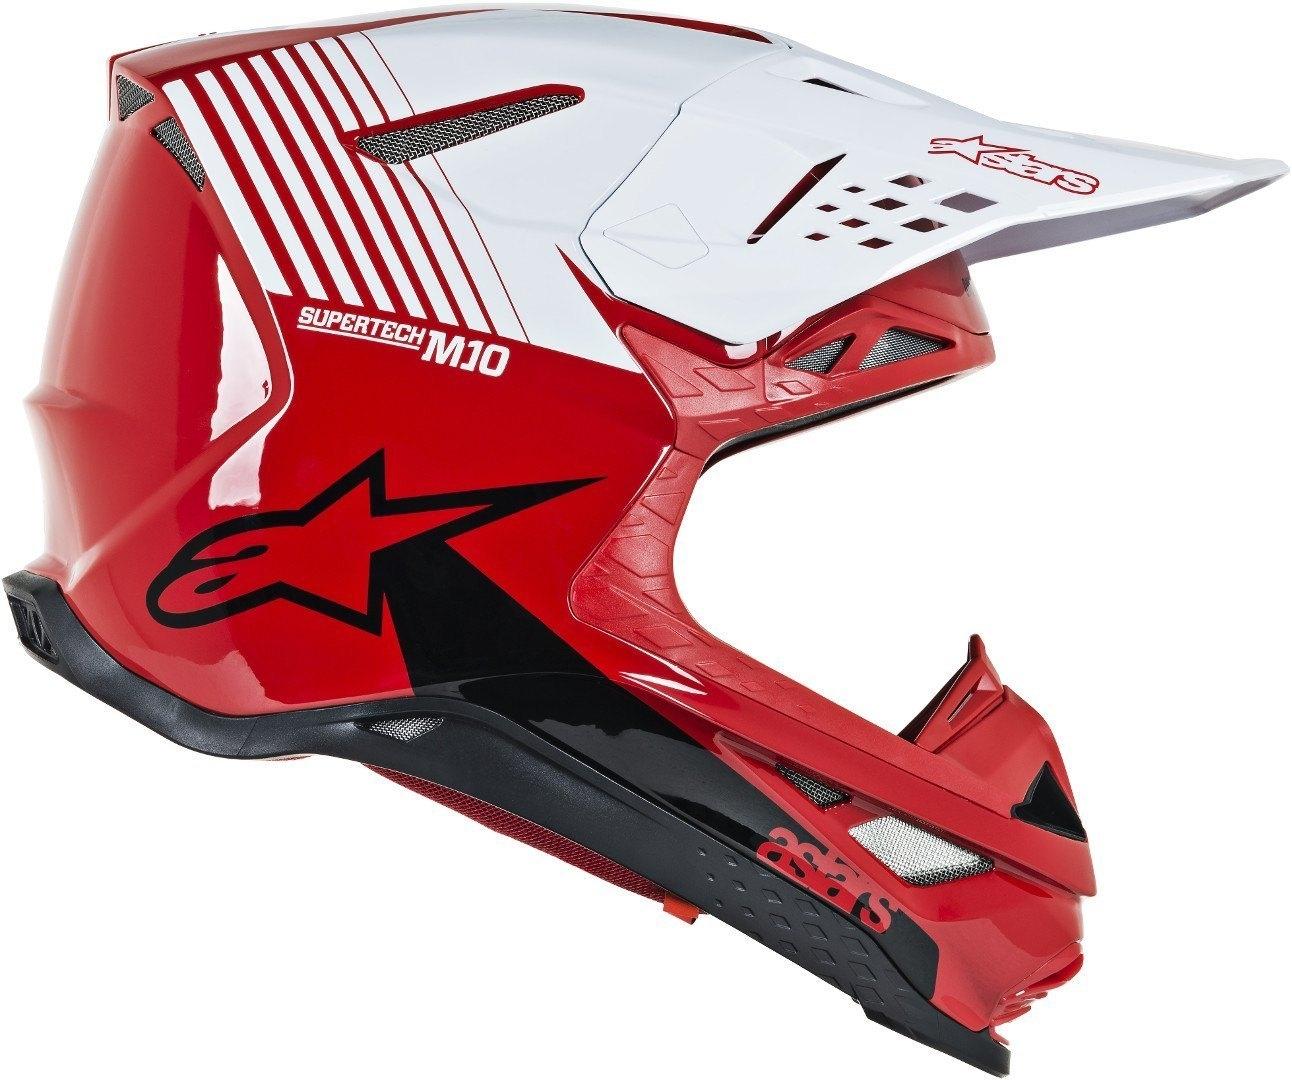 Casco cross alpinestars SUPERTECH S-M10 DYNO Red White Glossy 2